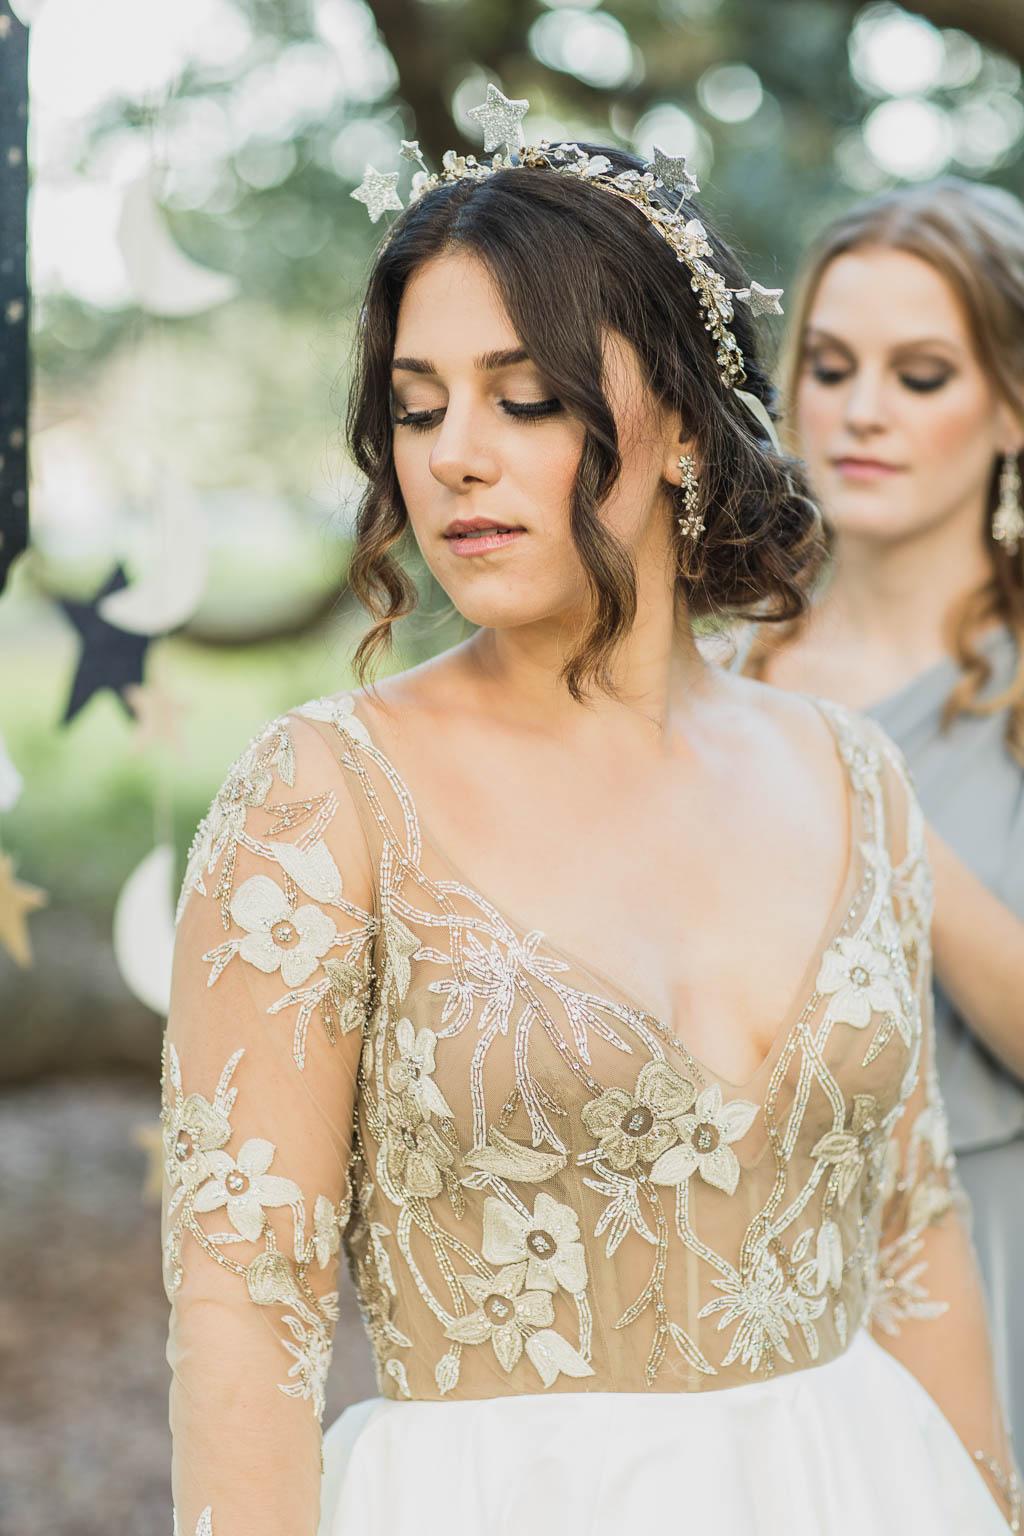 Wedding Crown New Orleans - Bride Film